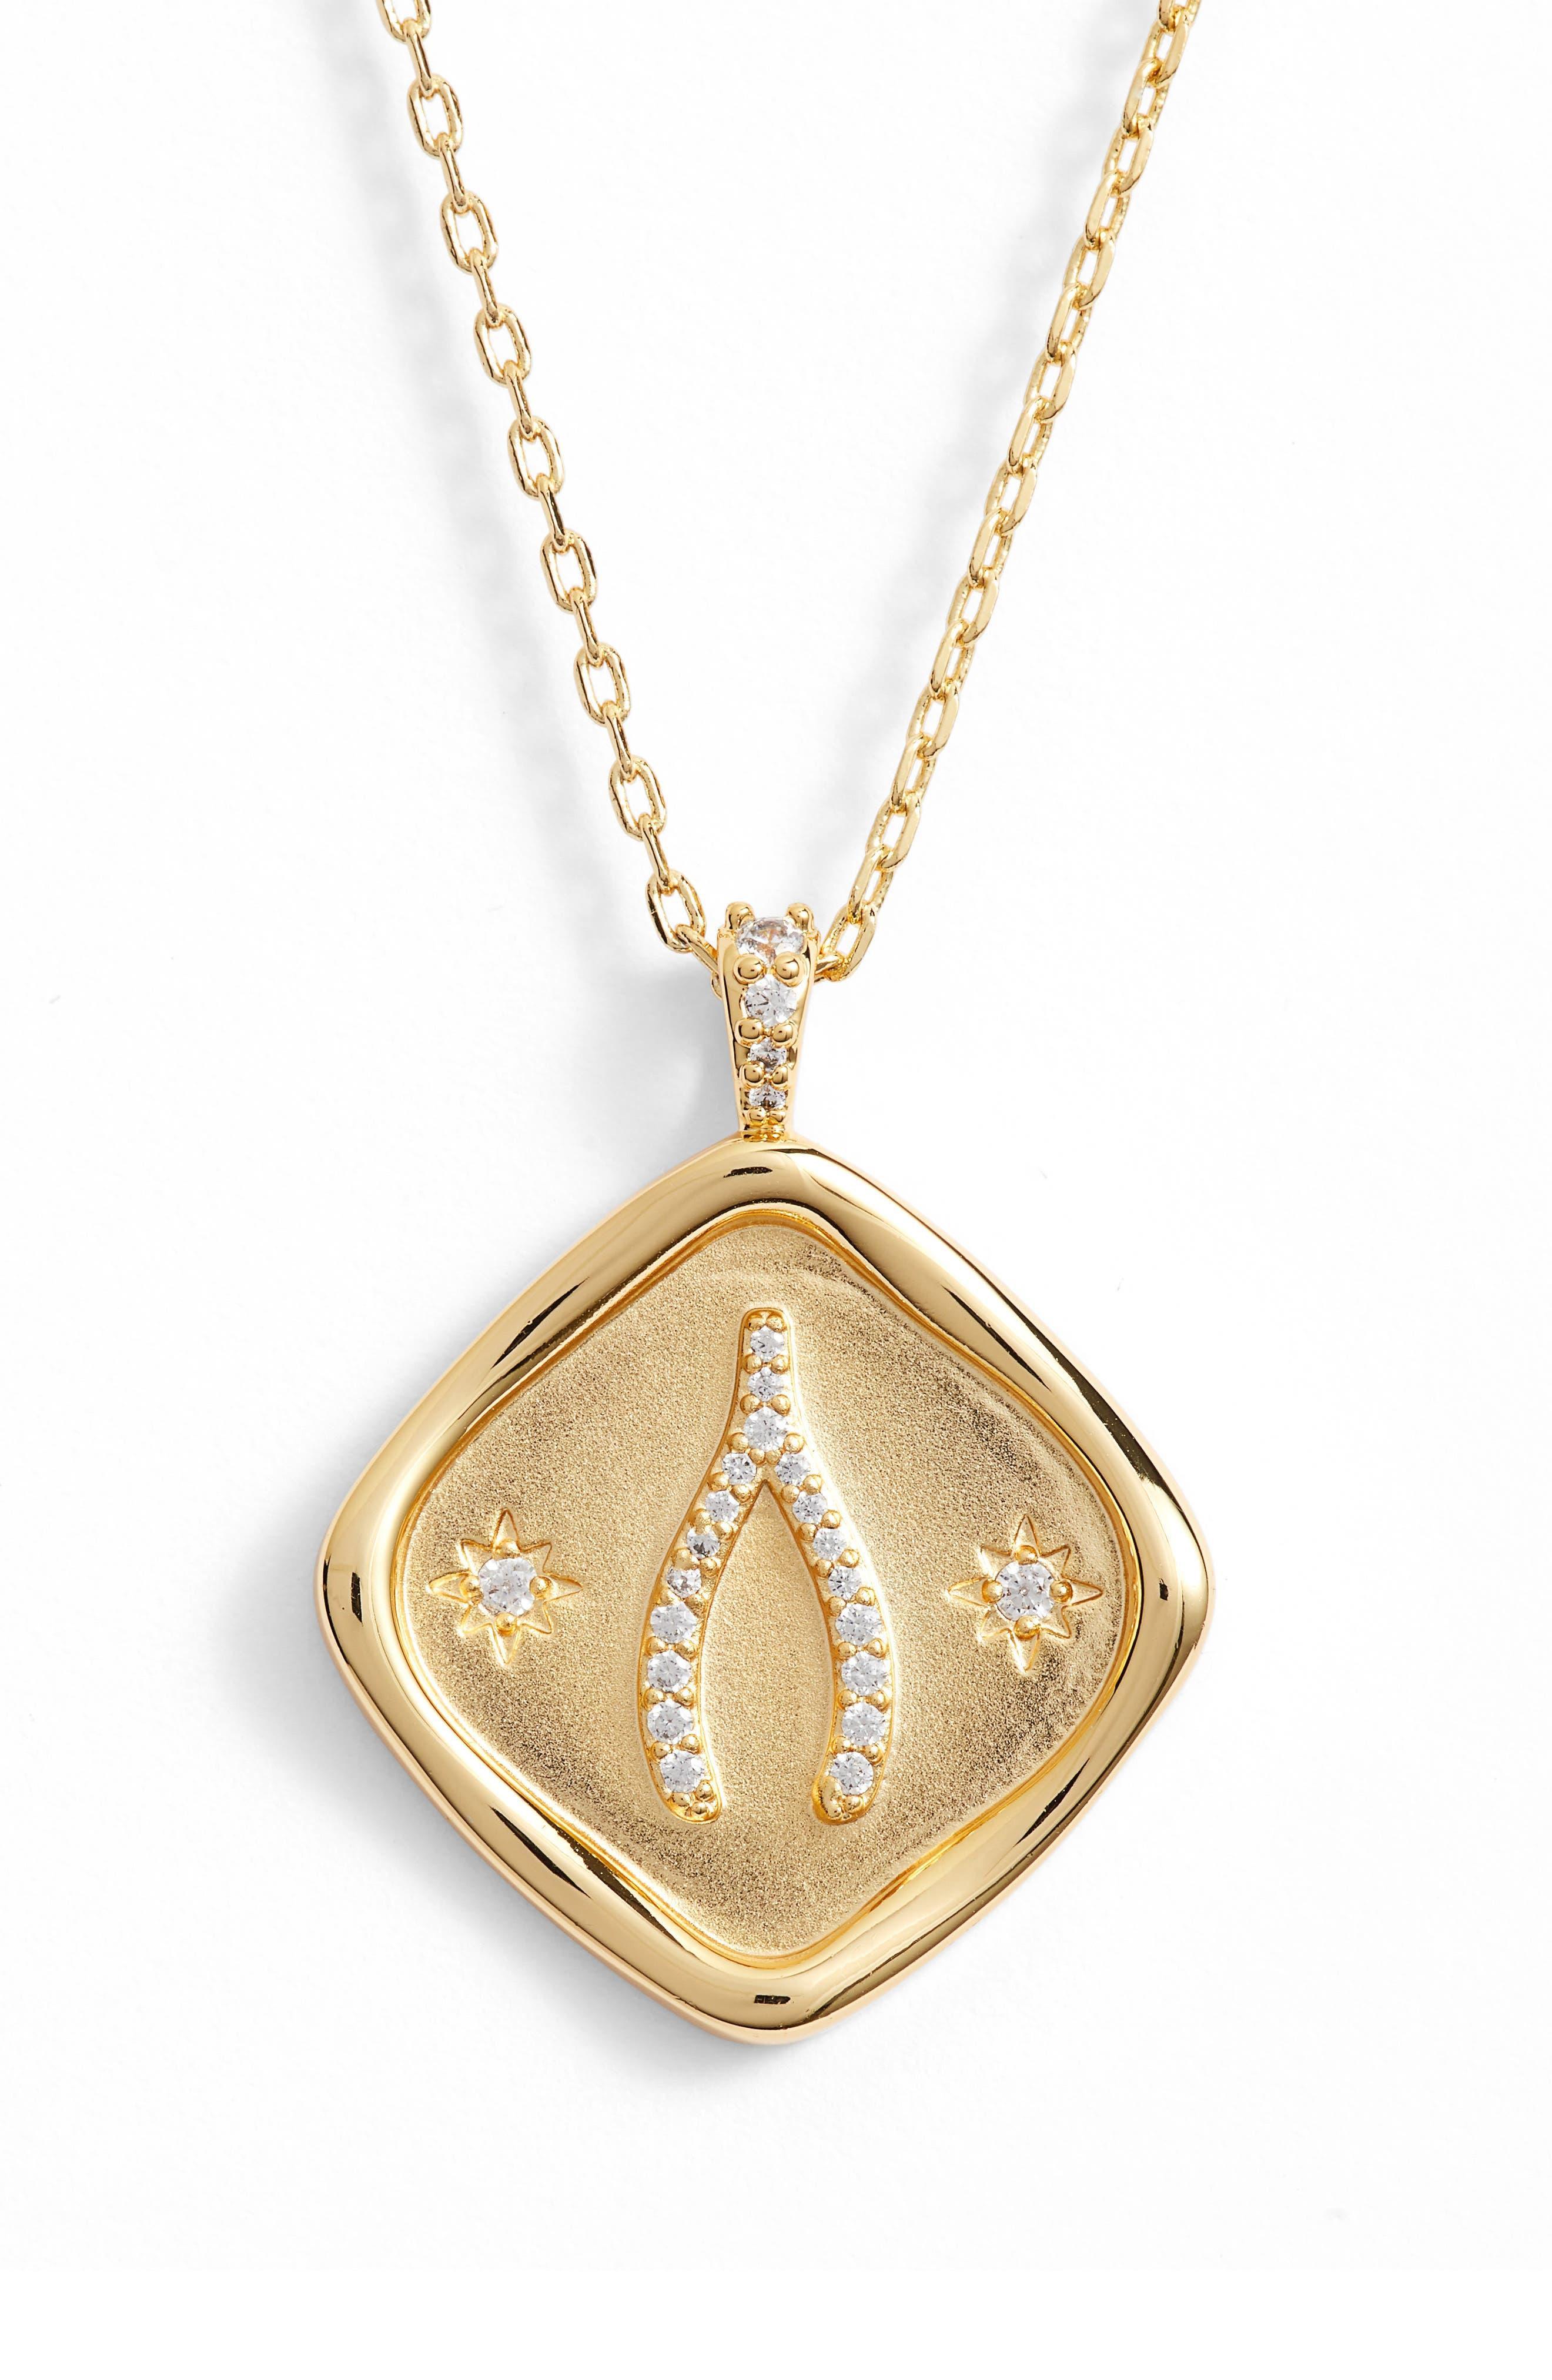 LULU DK X Kristina Schulman Luck Crystal Pendant Necklace in Gold